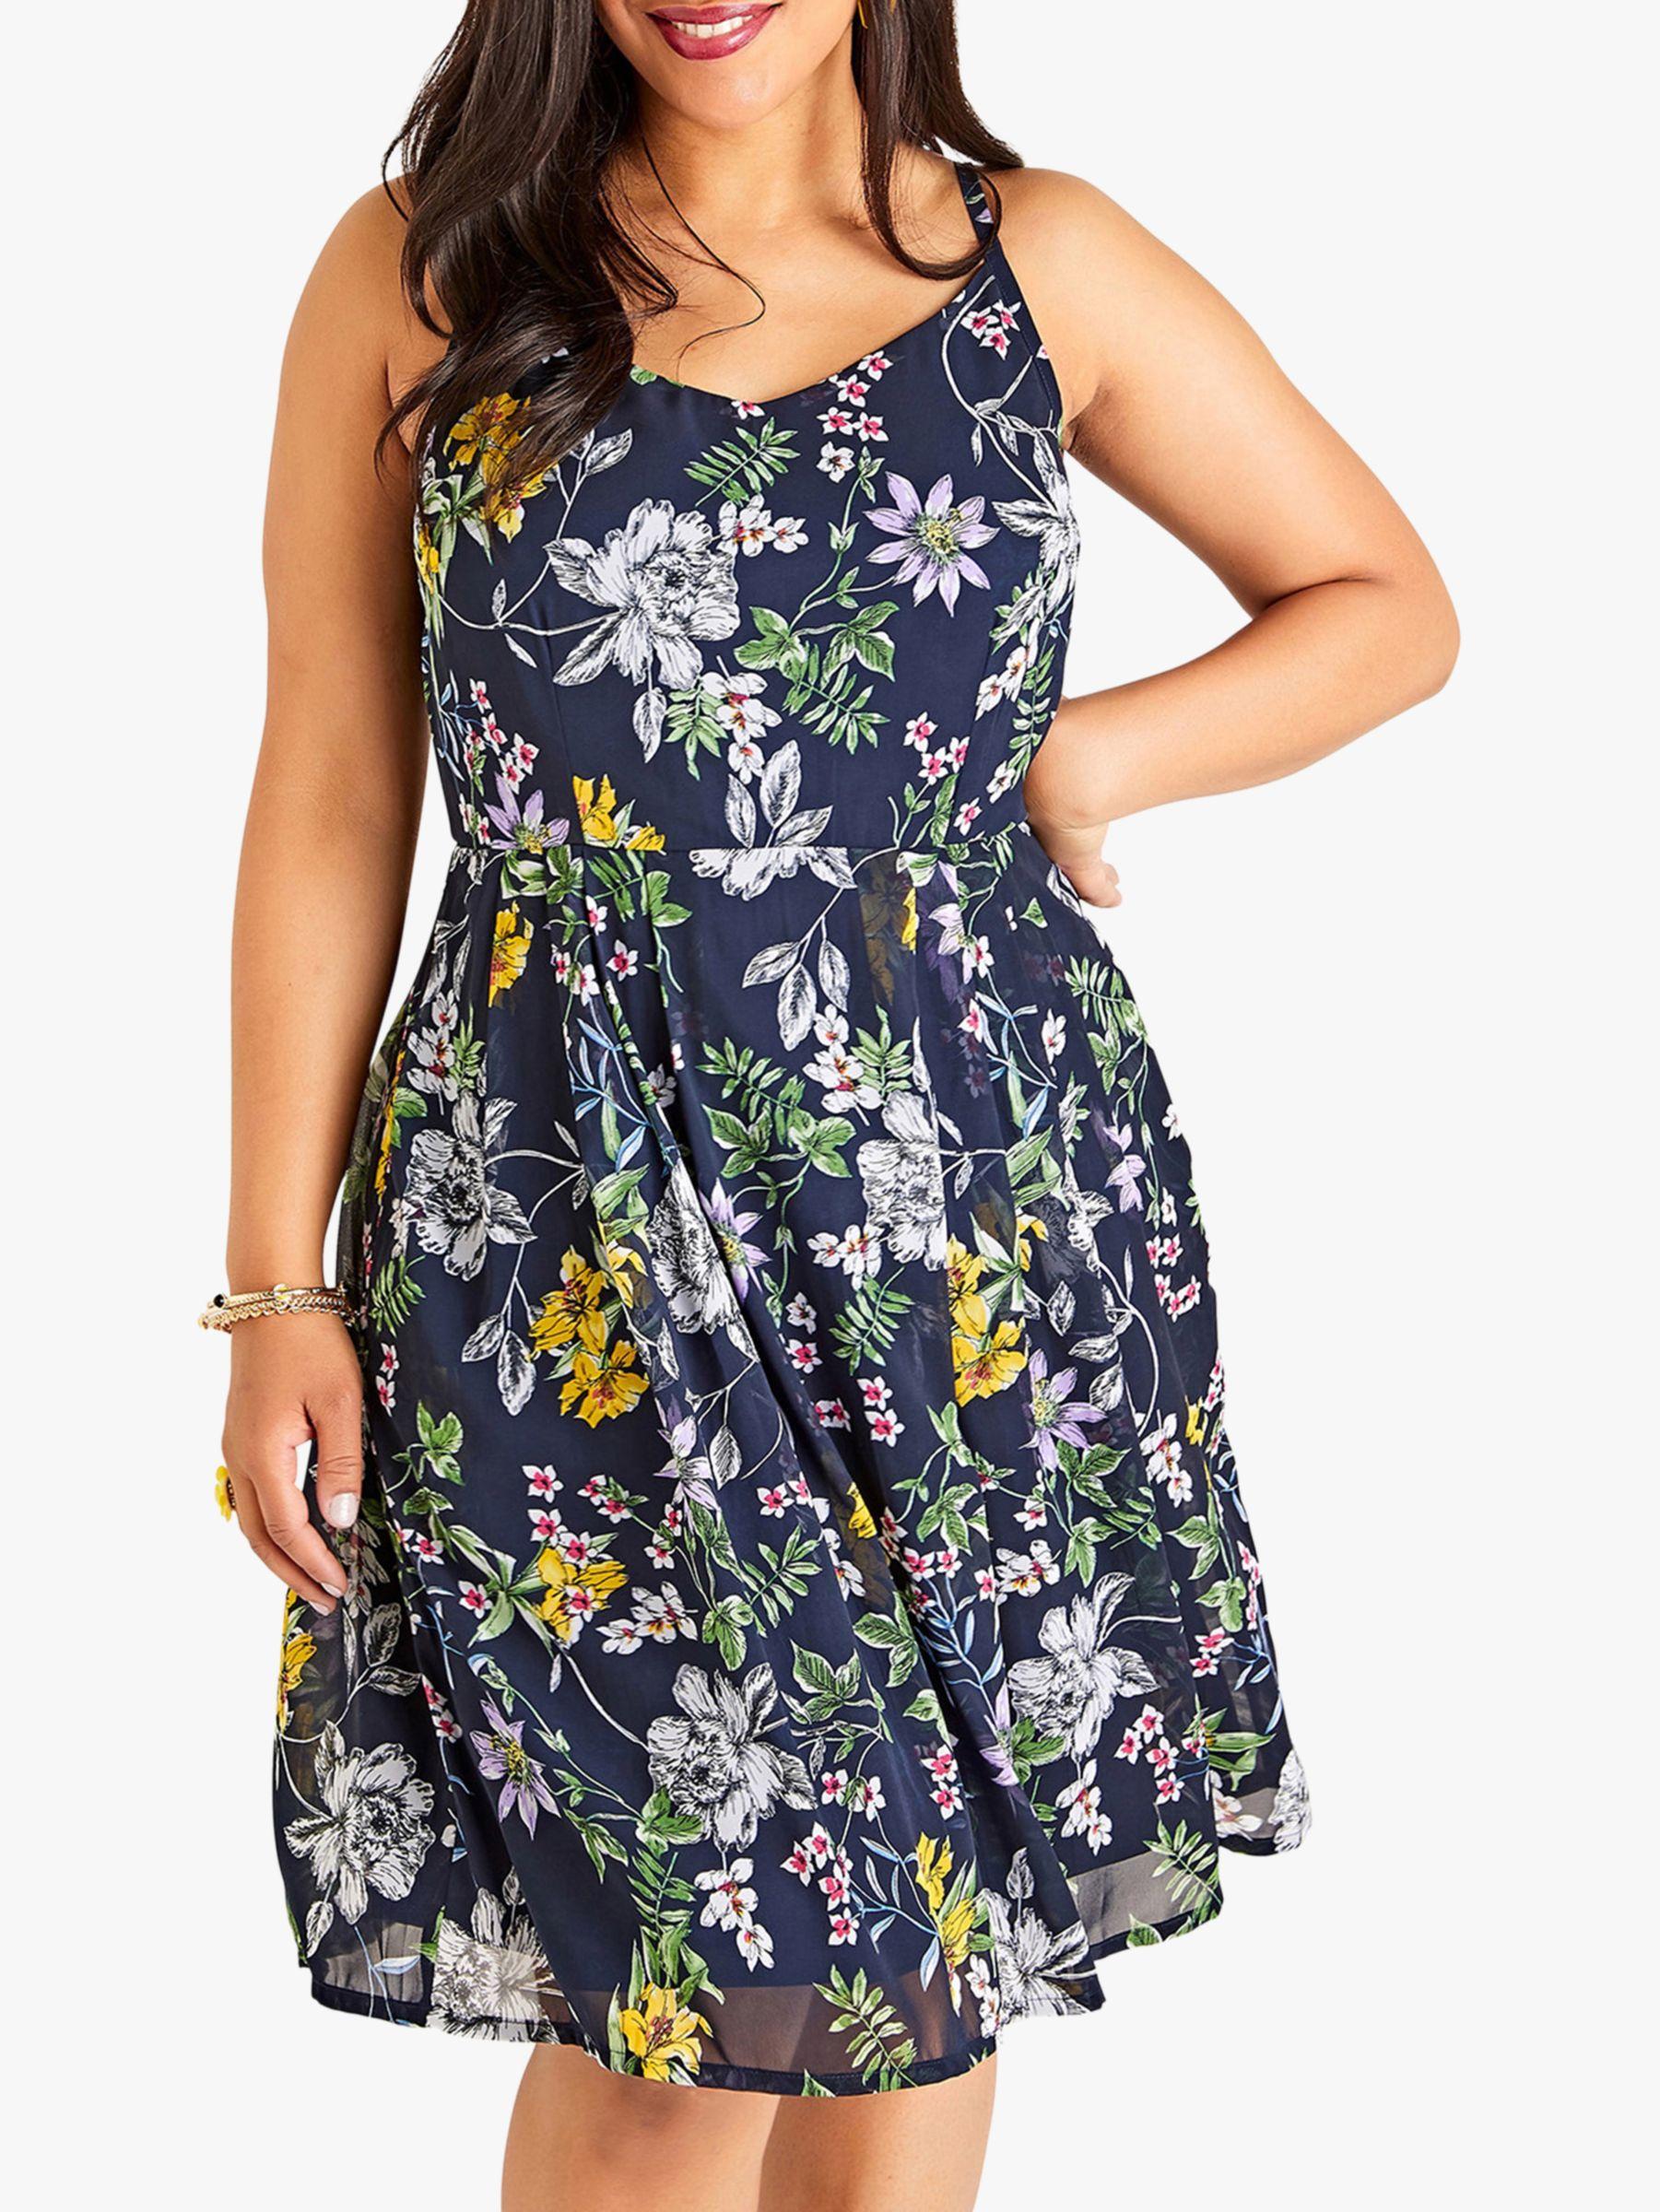 Yumi Curves Yumi Curves Strappy Floral Dress, Navy